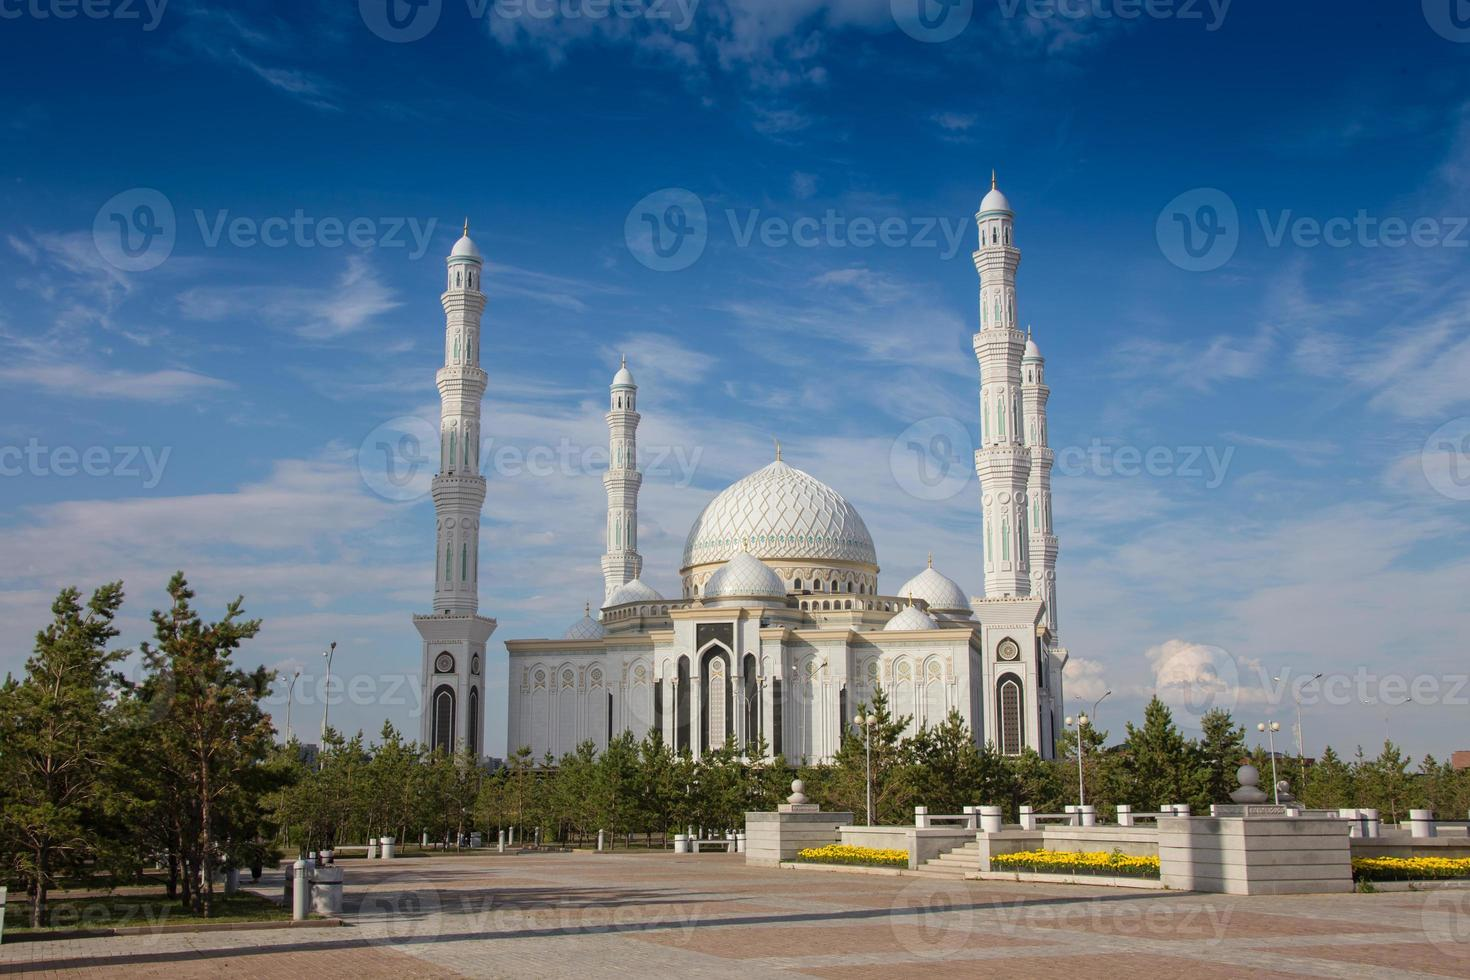 Yeni Cami Mosque  in  Astsana, Kazakhstan photo